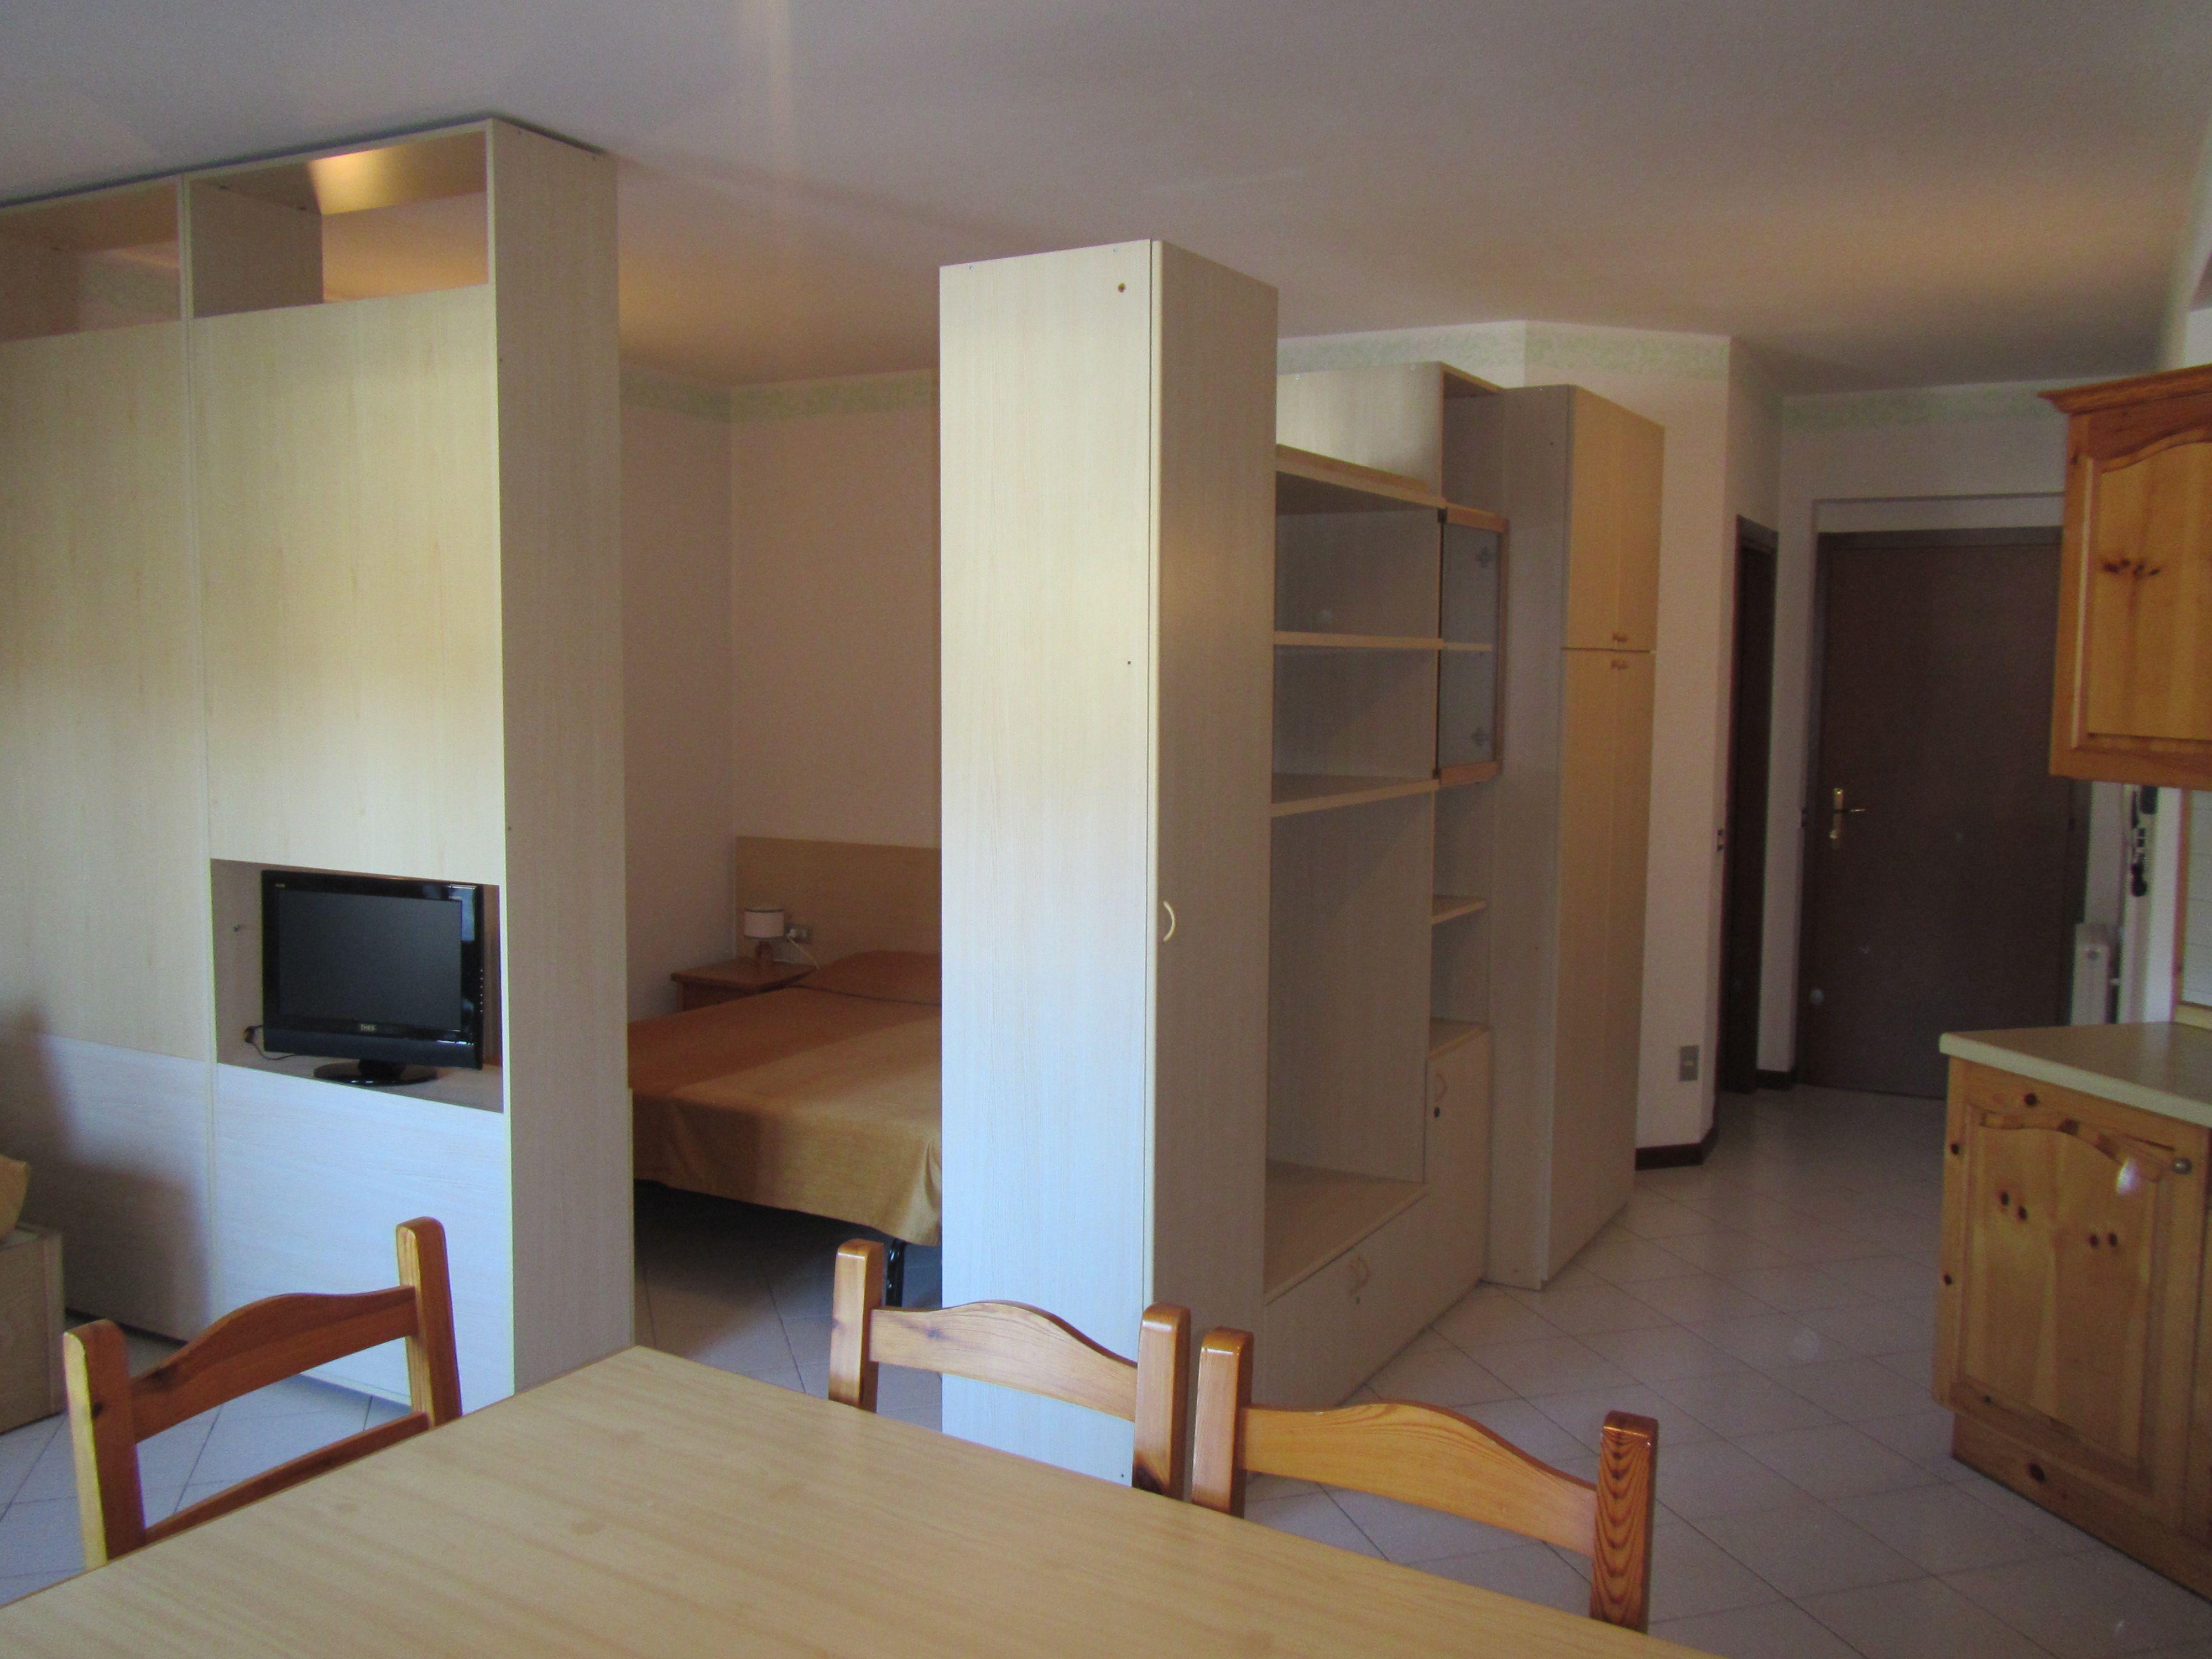 Appartamento monolocale Tipo C residence con